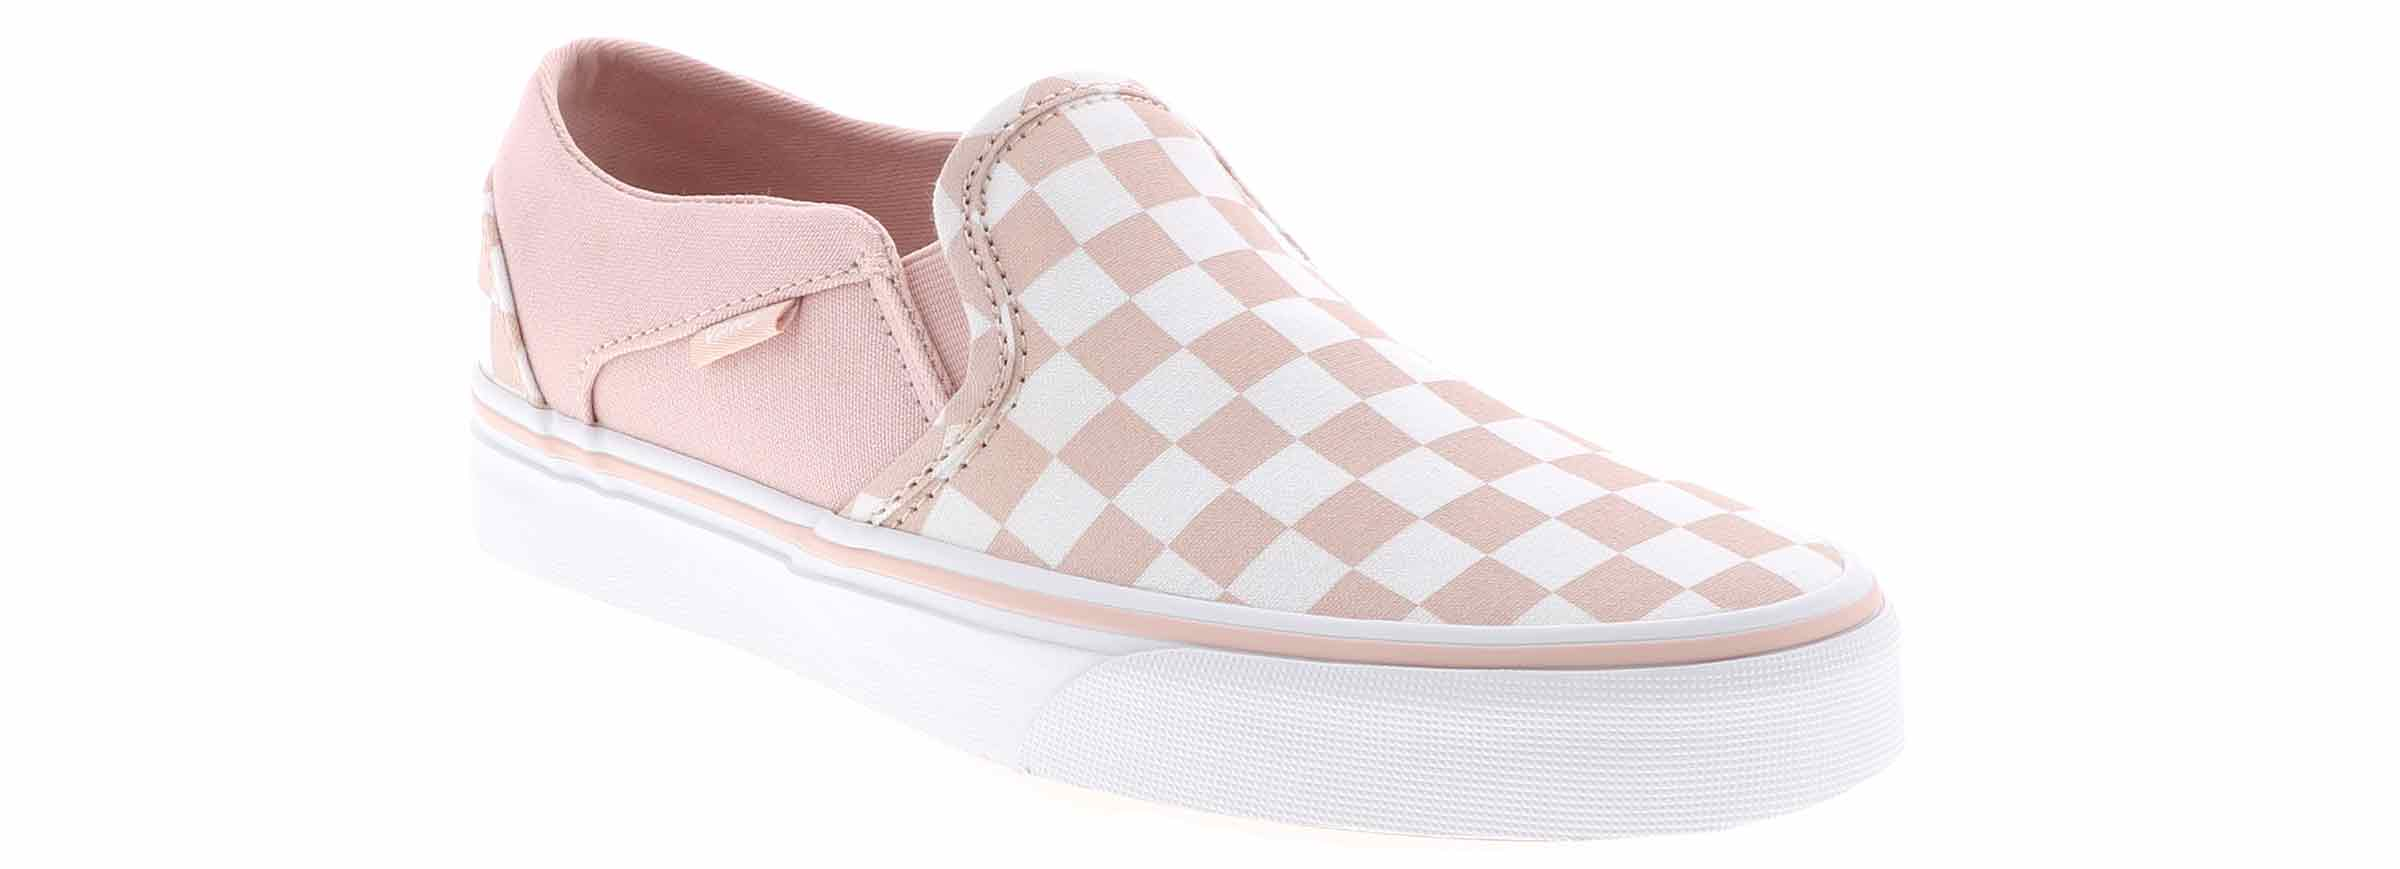 Women's Vans Asher Blush Shoe Sensation  Shoe Sensation